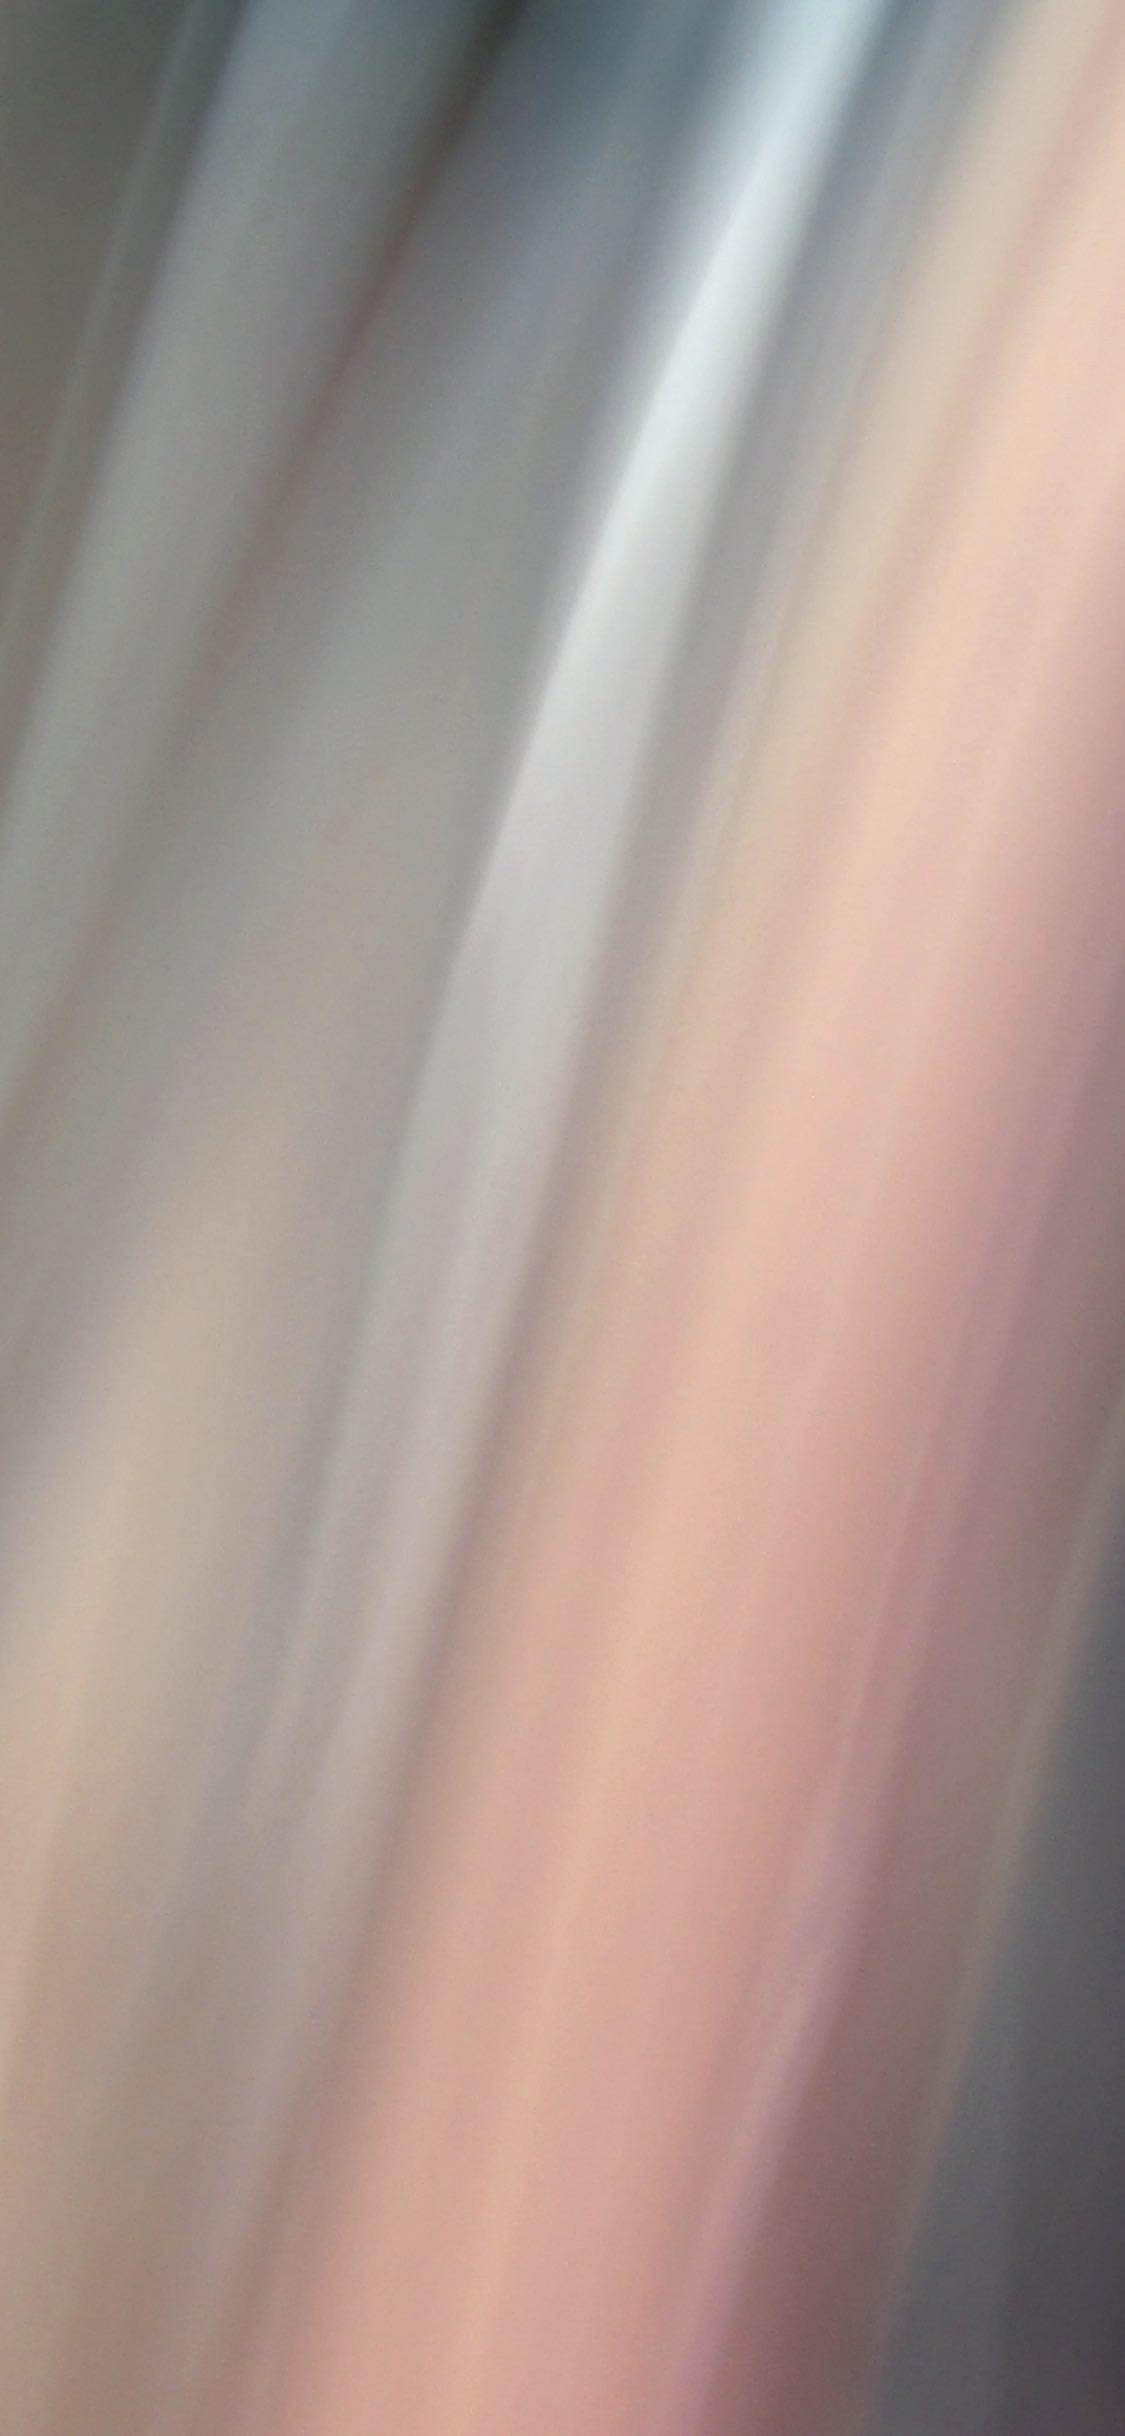 iPhone XS , iPhone X wallpaper 0342